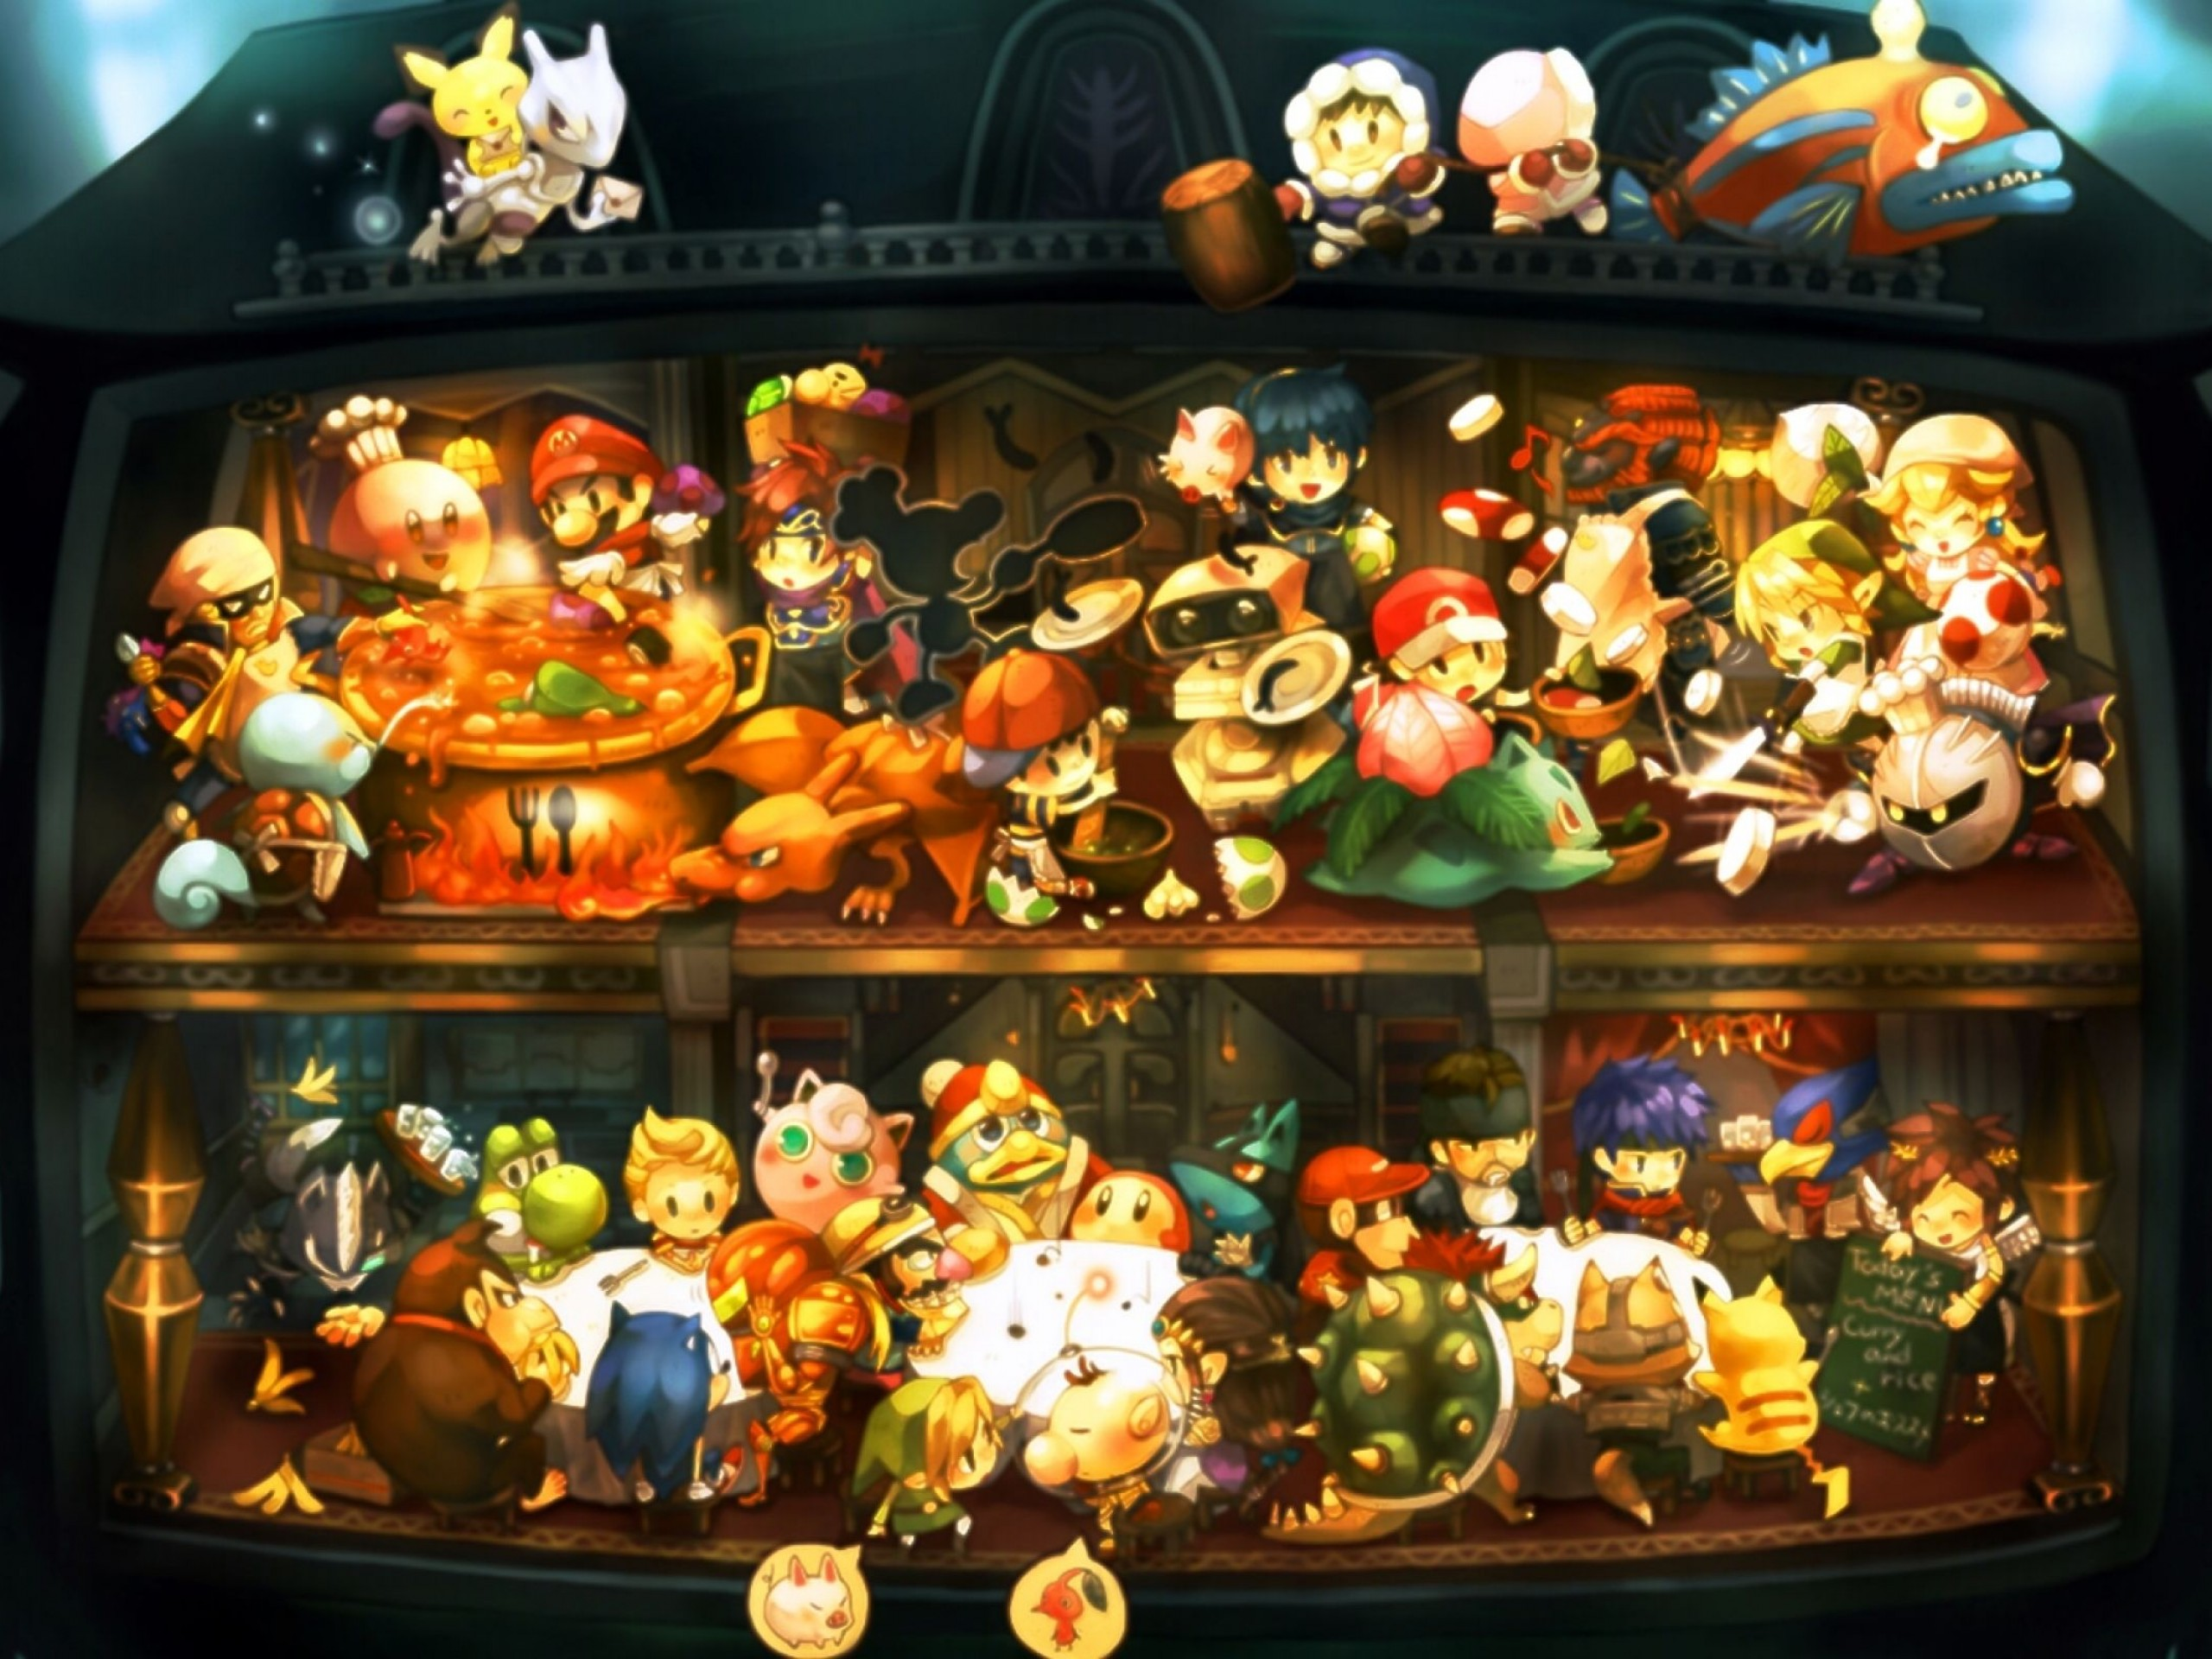 Nintendo-Jigglypuff-Super-Smash-Bros-Brawl-1920×2560